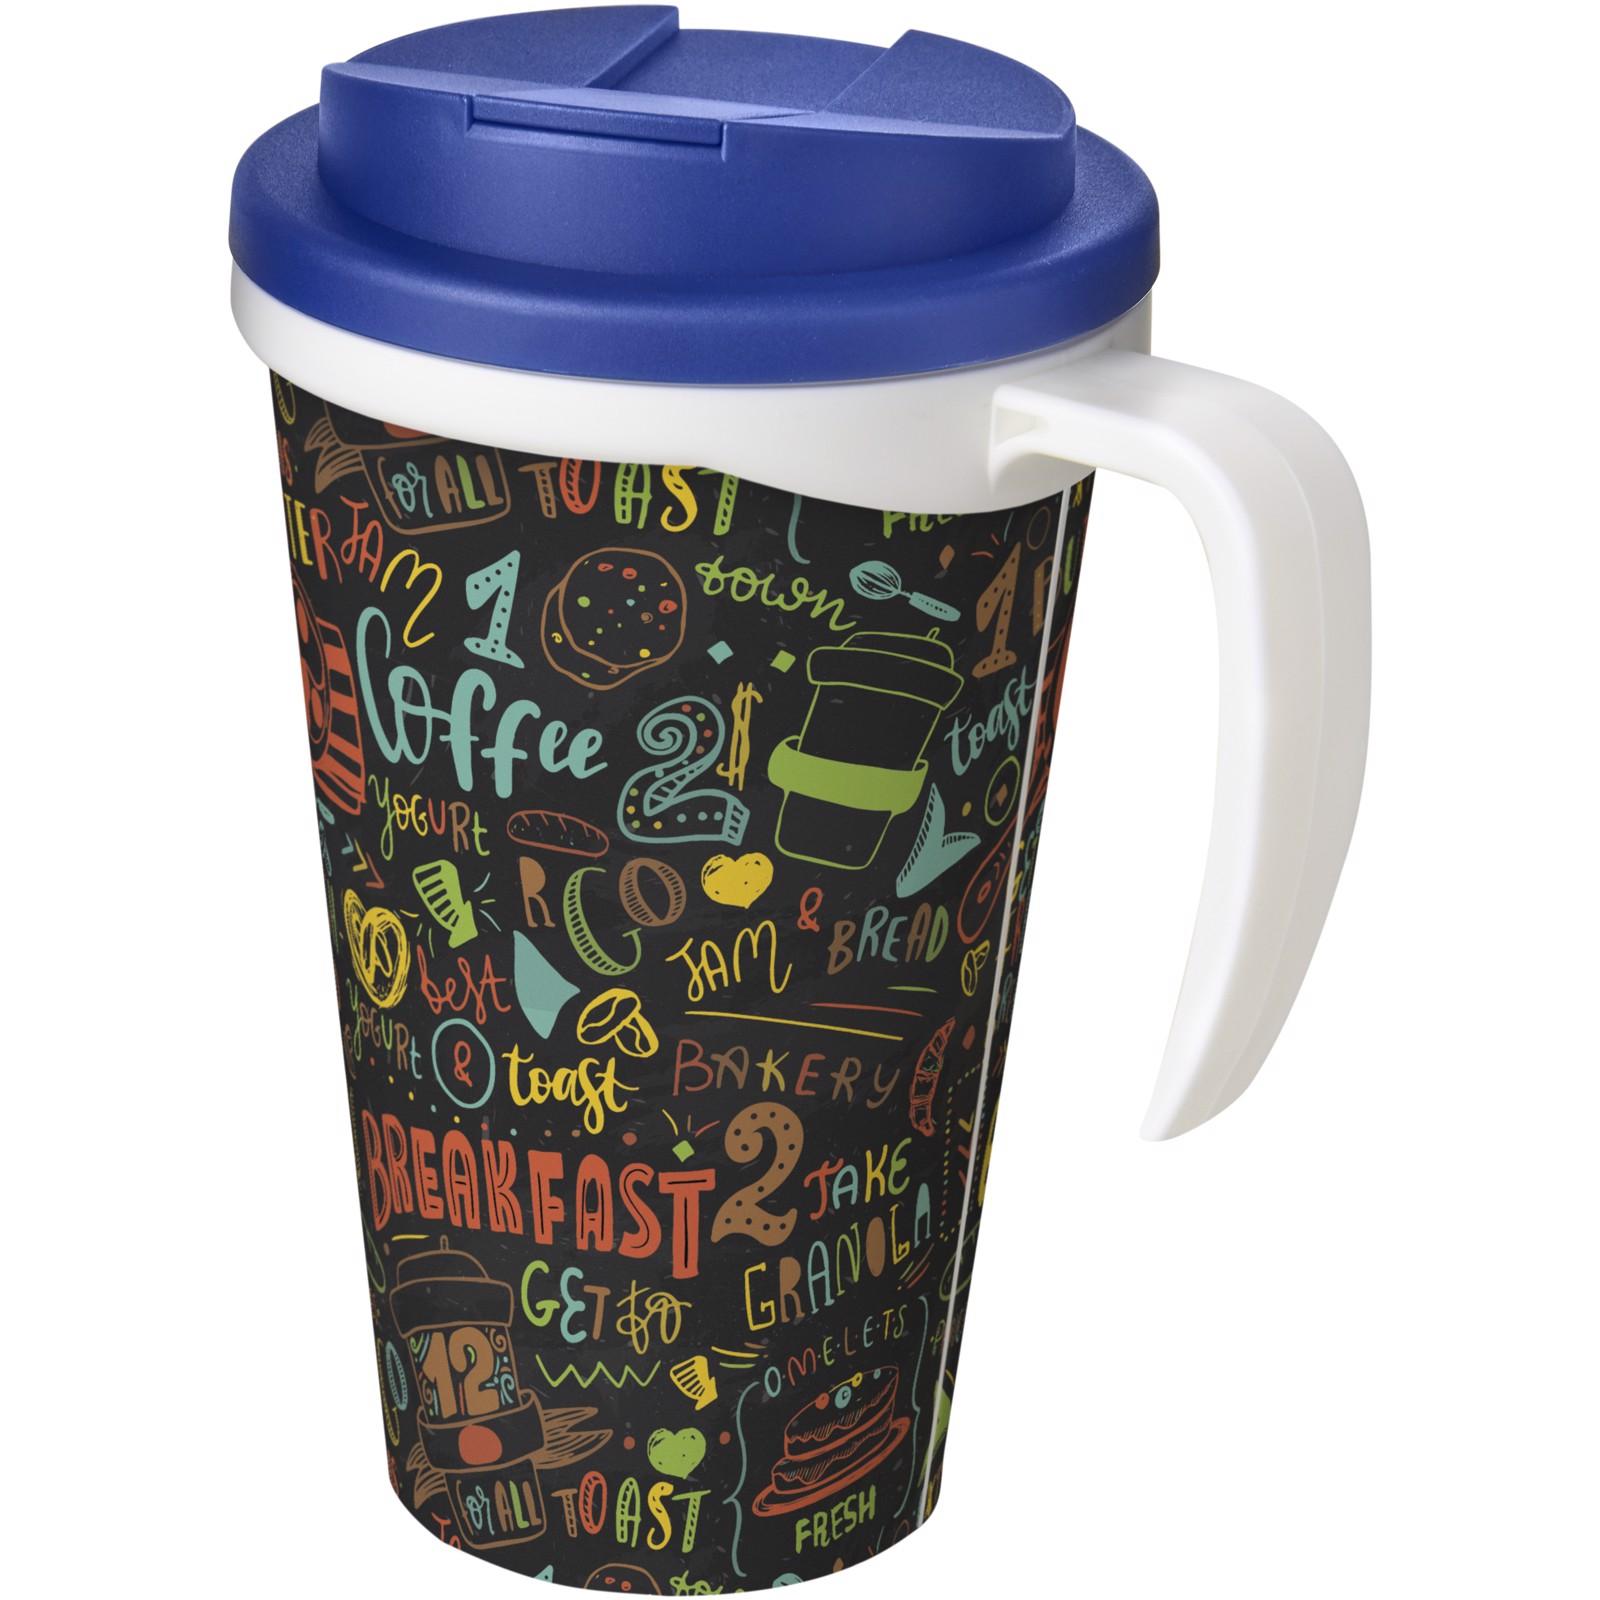 Brite-Americano Grande 350 ml mug with spill-proof lid - White / Blue